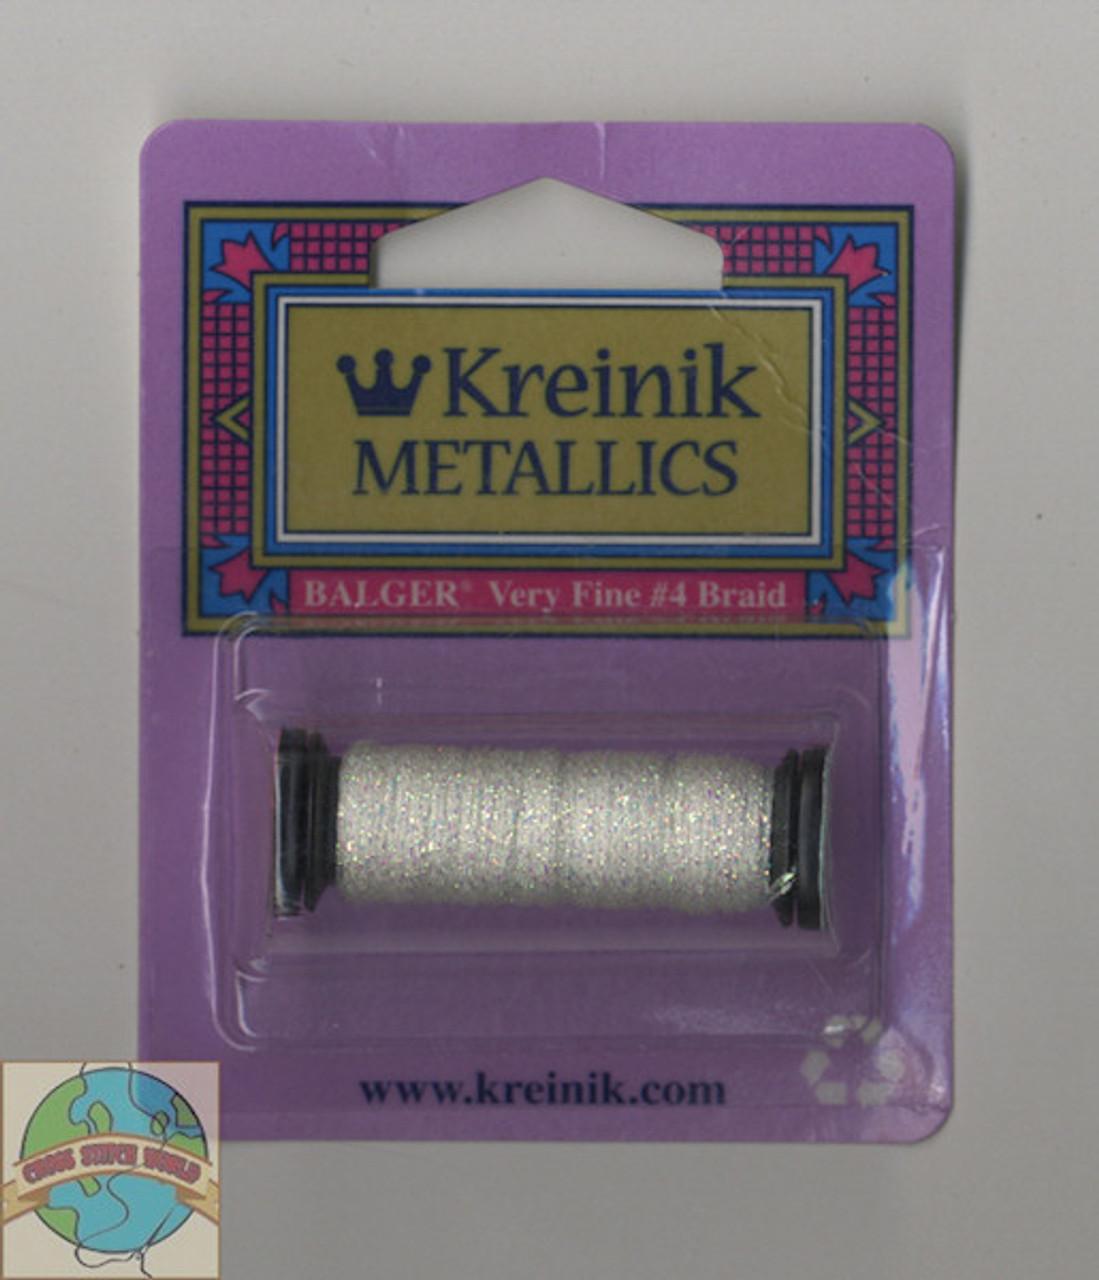 Kreinik Metallics - Very Fine #4 Pearl #032